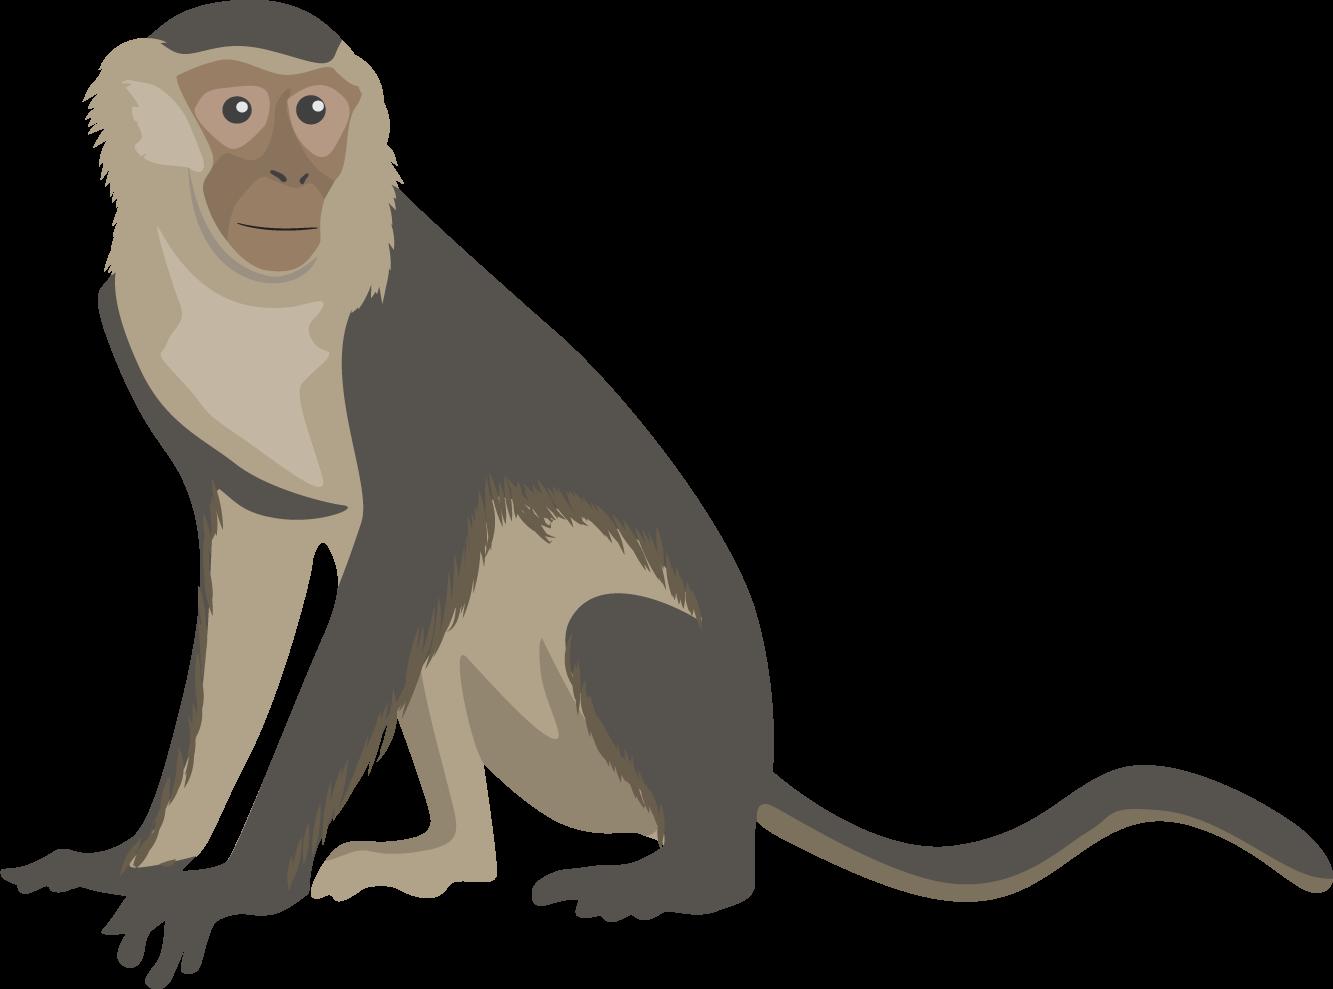 Monkey clipart capuchin monkey. Png transparent free images